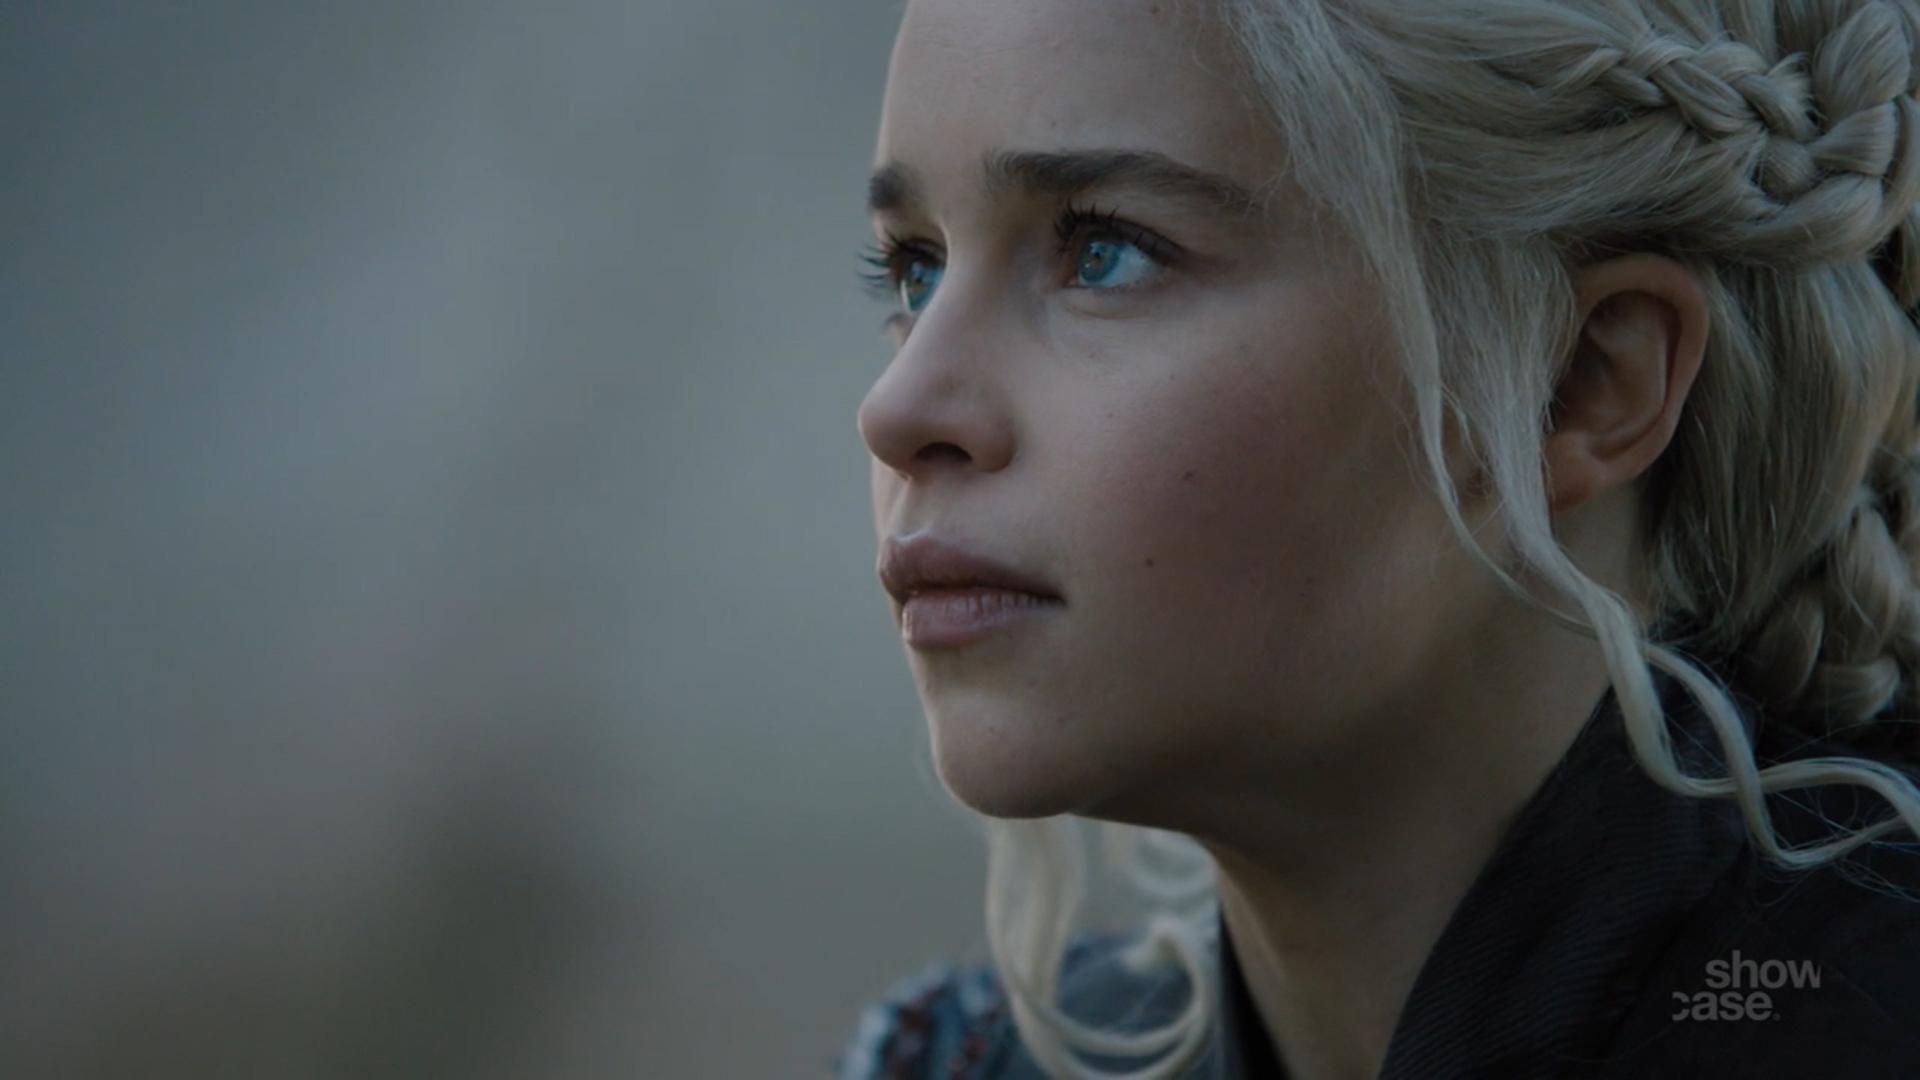 Game of thrones season 7 episode 1 dragonstone film for Daenerys jewelry season 7